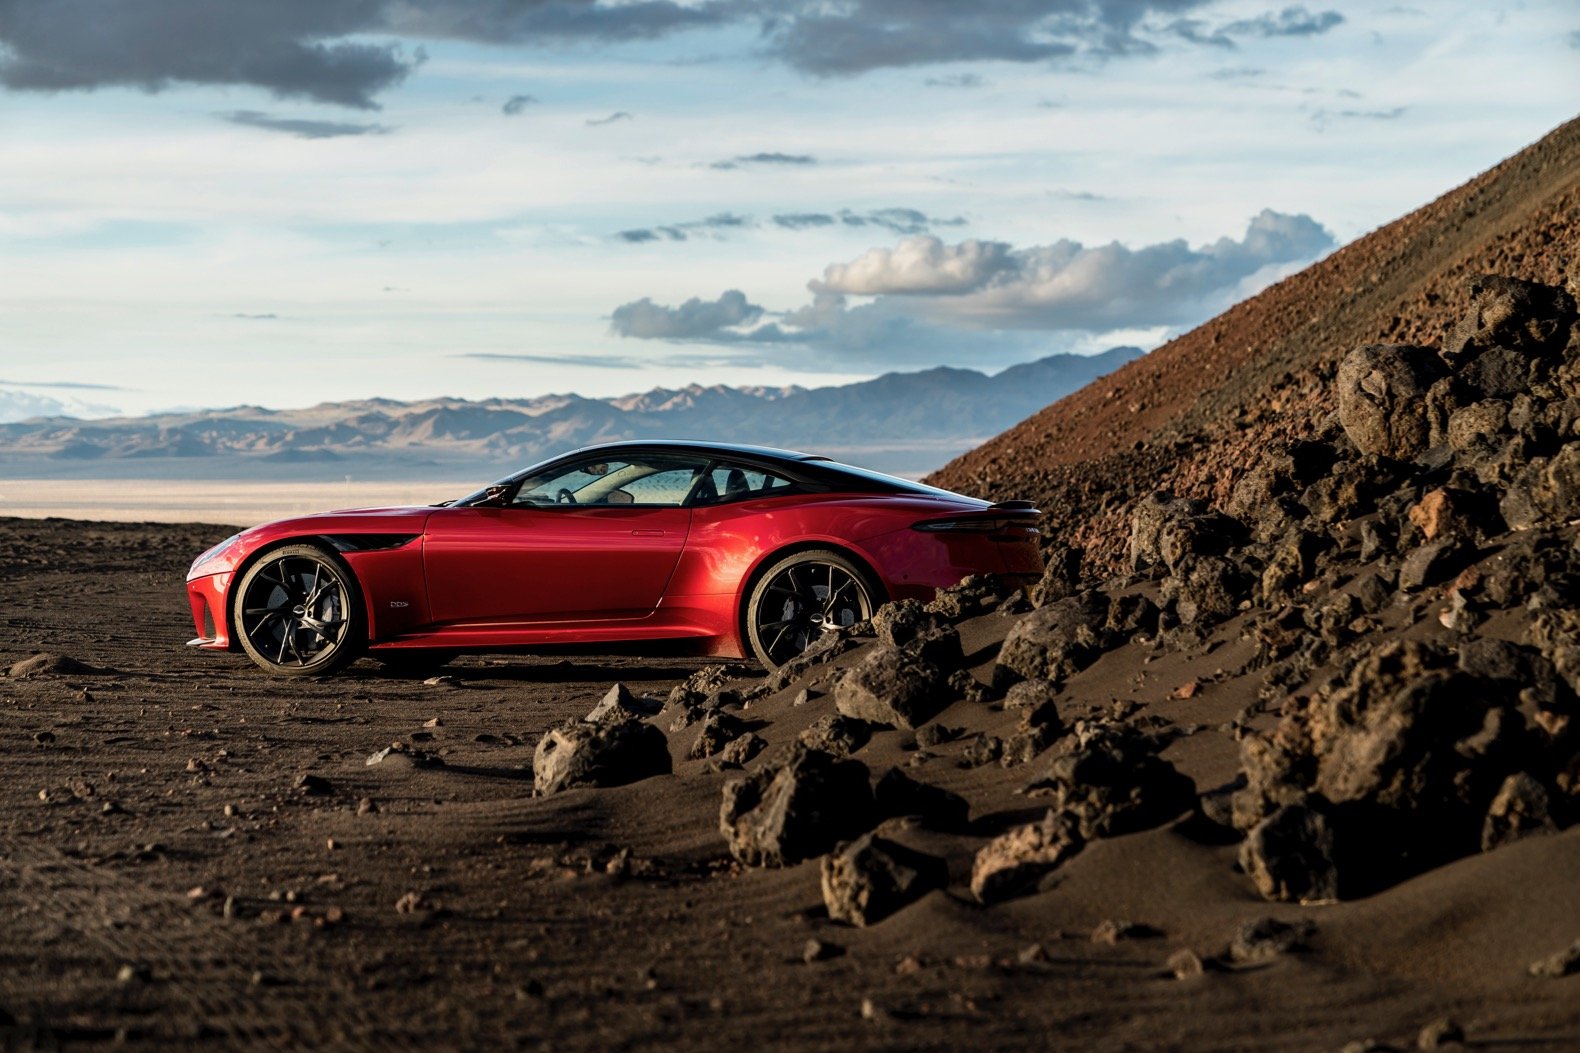 2019-Aston-Martin-DBS-Superleggera-00014.jpg